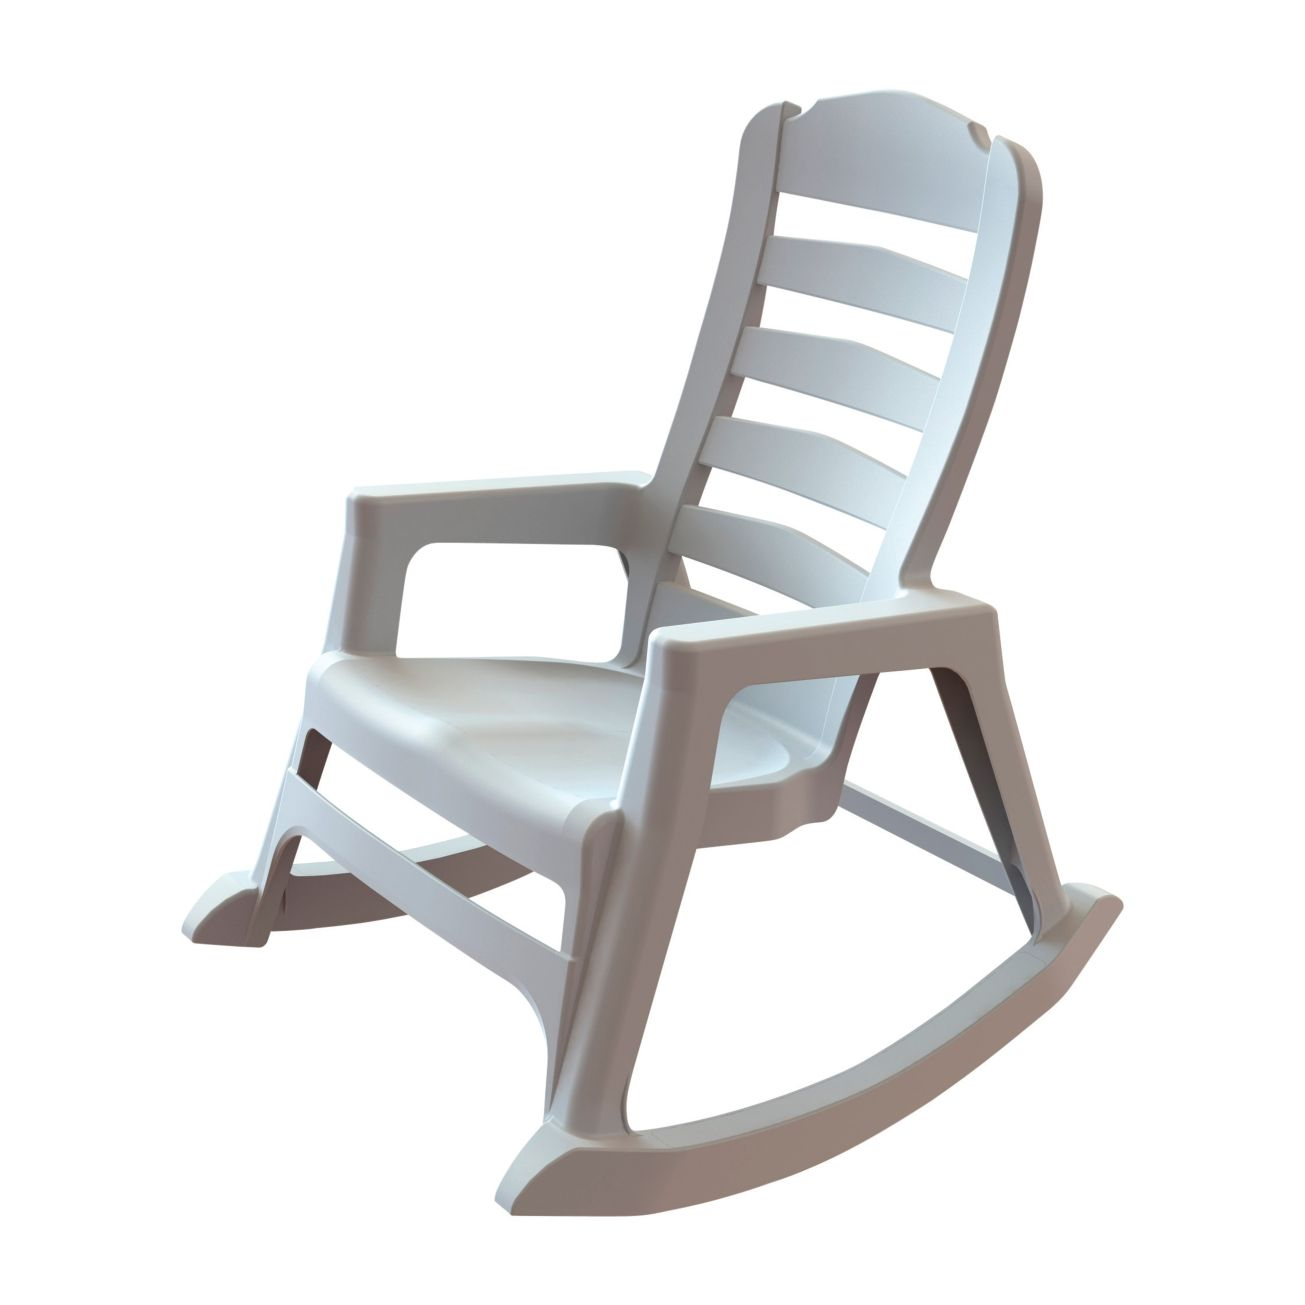 Miraculous Adams Stacking Resin White Rocking Chair 8080 48 3700 Inzonedesignstudio Interior Chair Design Inzonedesignstudiocom